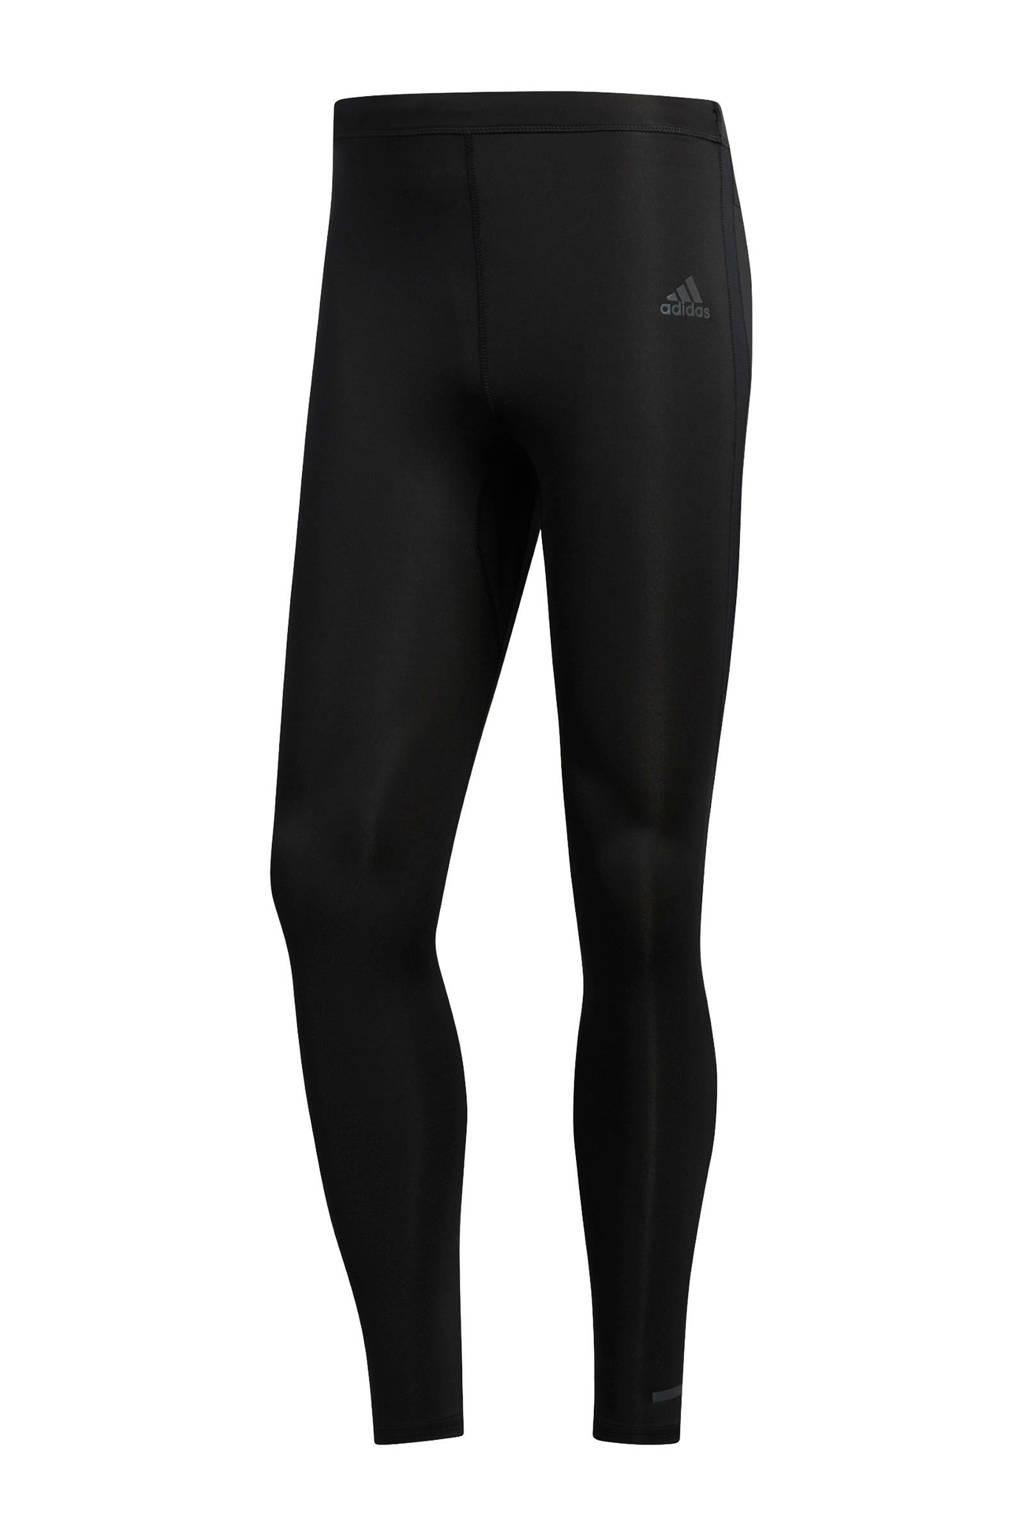 adidas Performance   Own The Run hardloopbroek zwart, Zwart